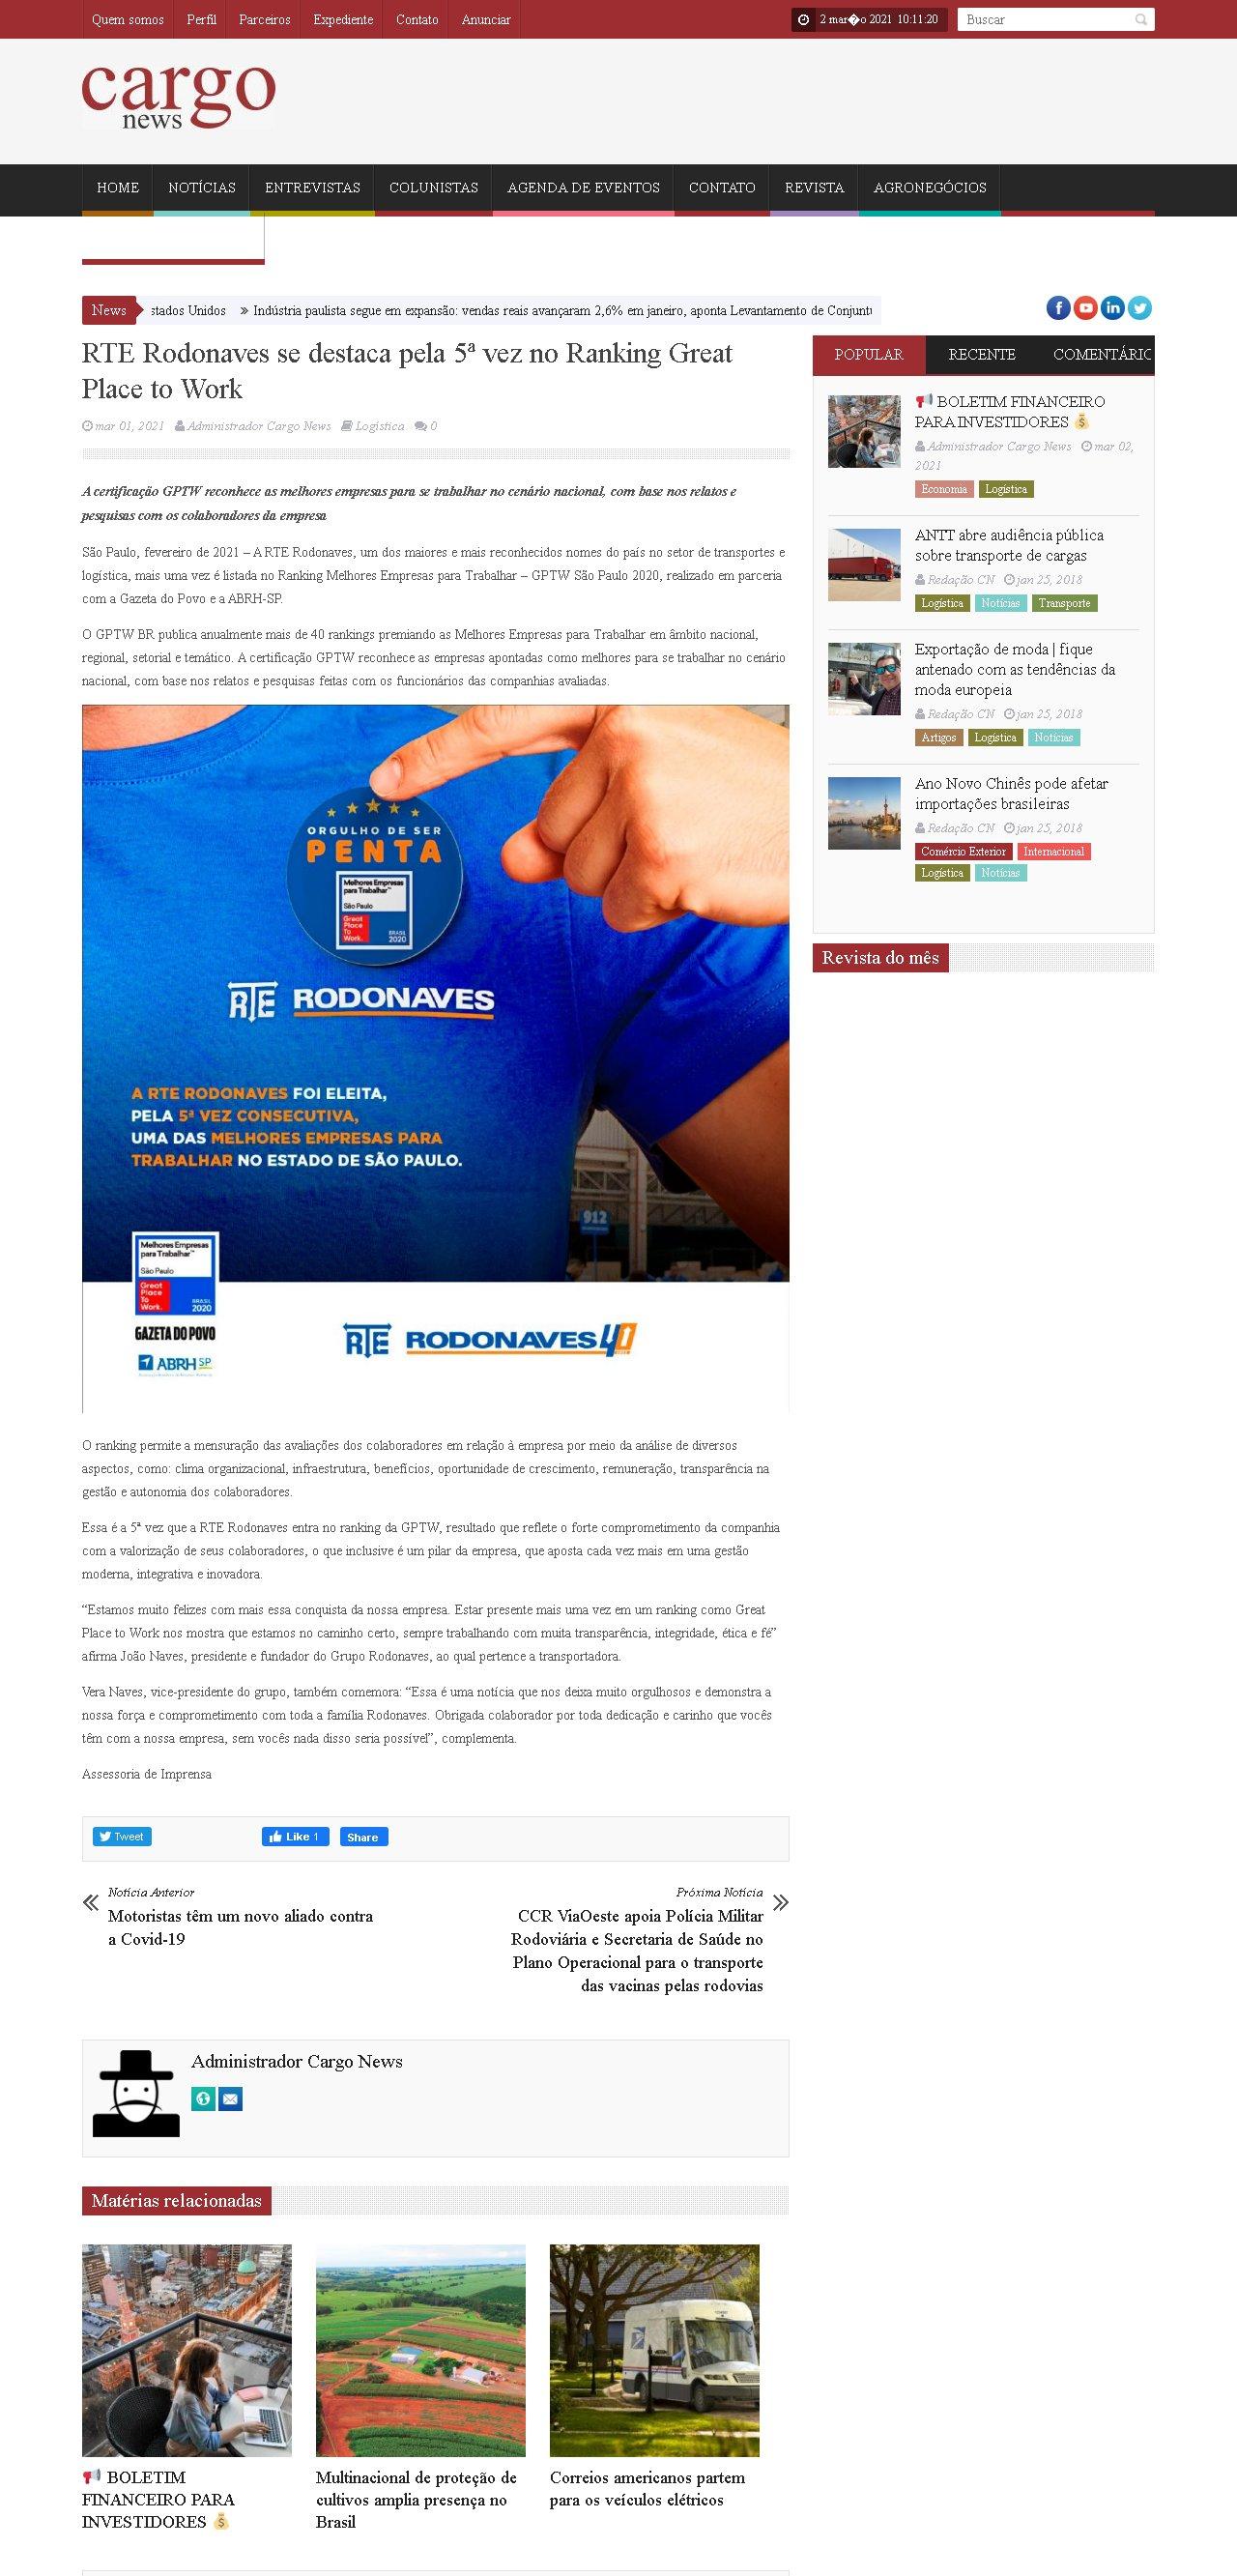 RTE Rodonaves se destaca pela 5ª vez no Ranking Great Place to Work - Cargo News